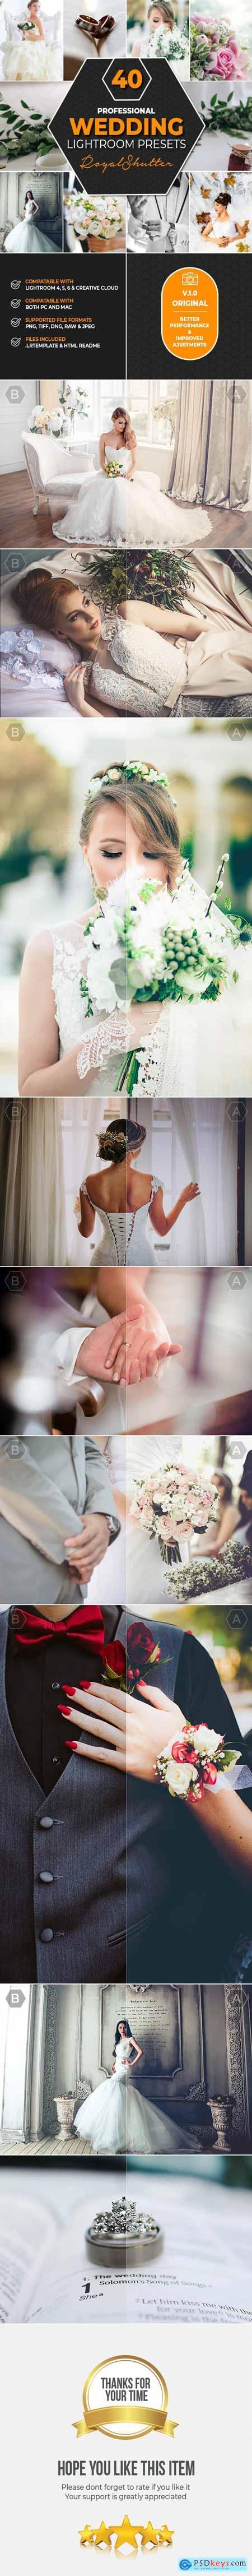 40 Pro Wedding Lightroom Presets 23150886